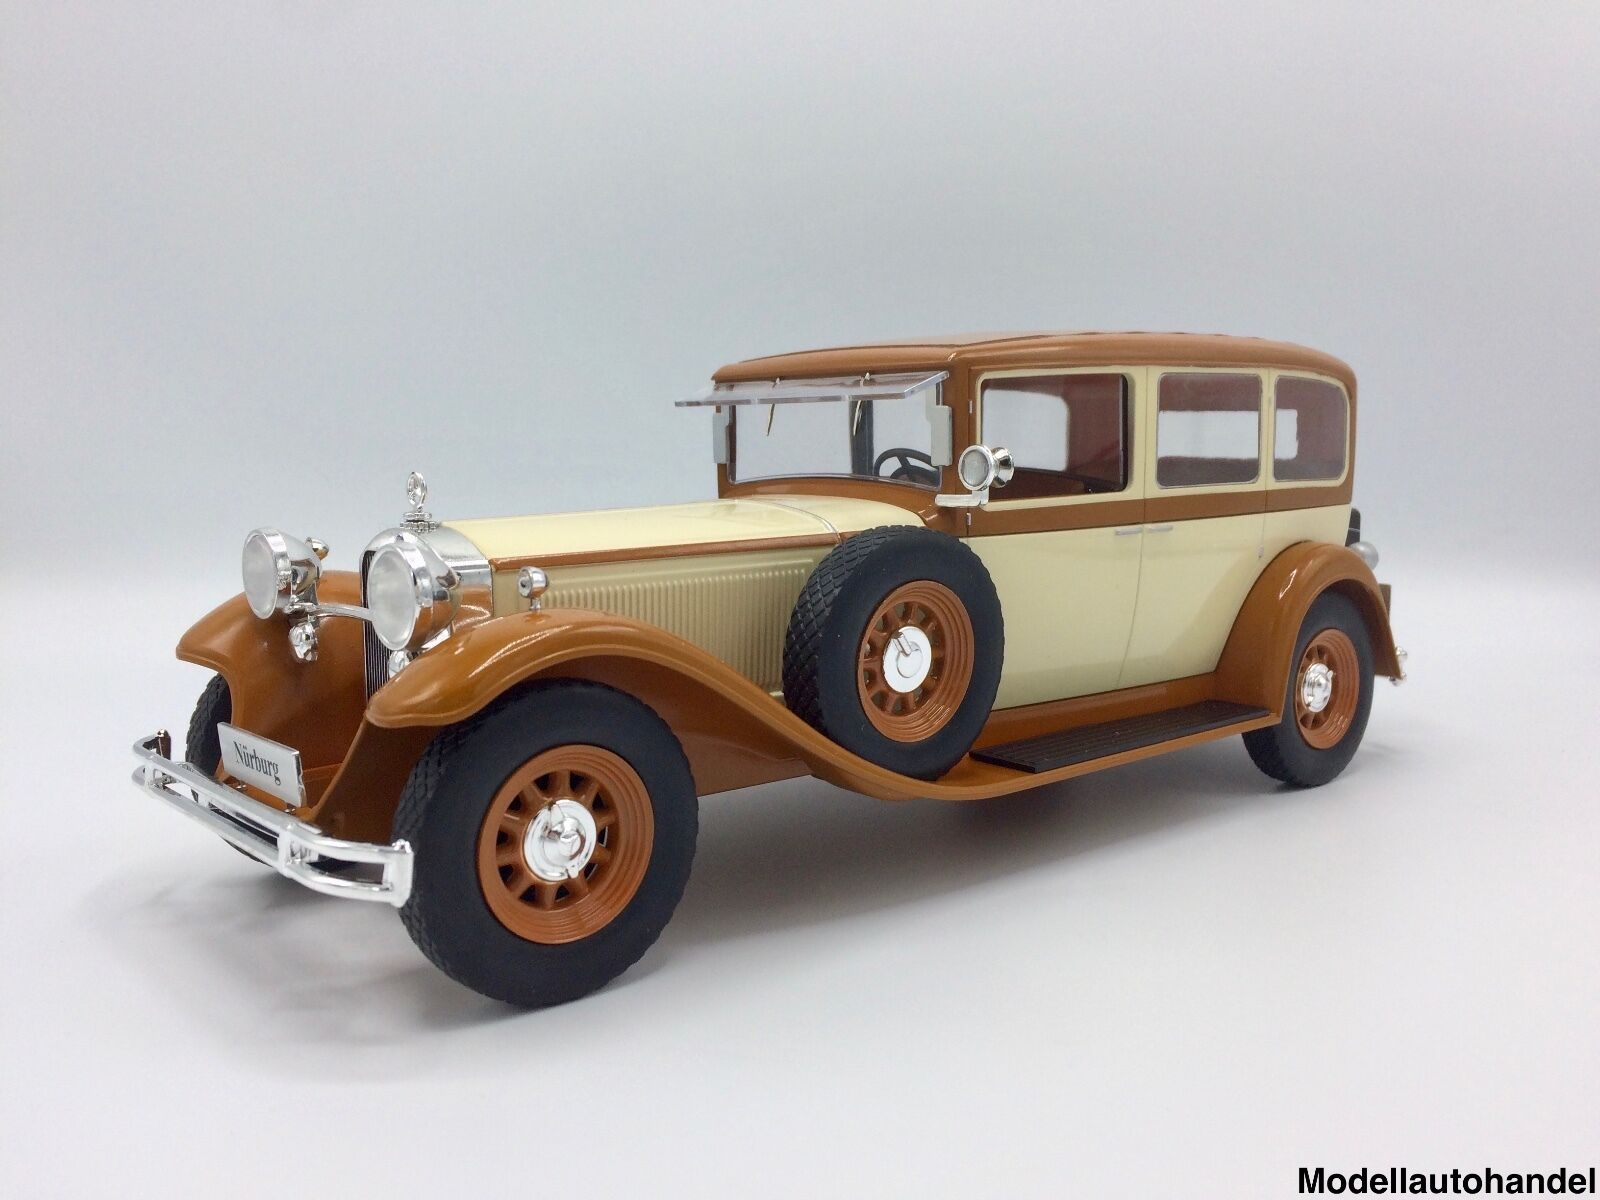 MERCEDES type Nürburg 460 1928 BEIGE MARRON - 1 18 MCG